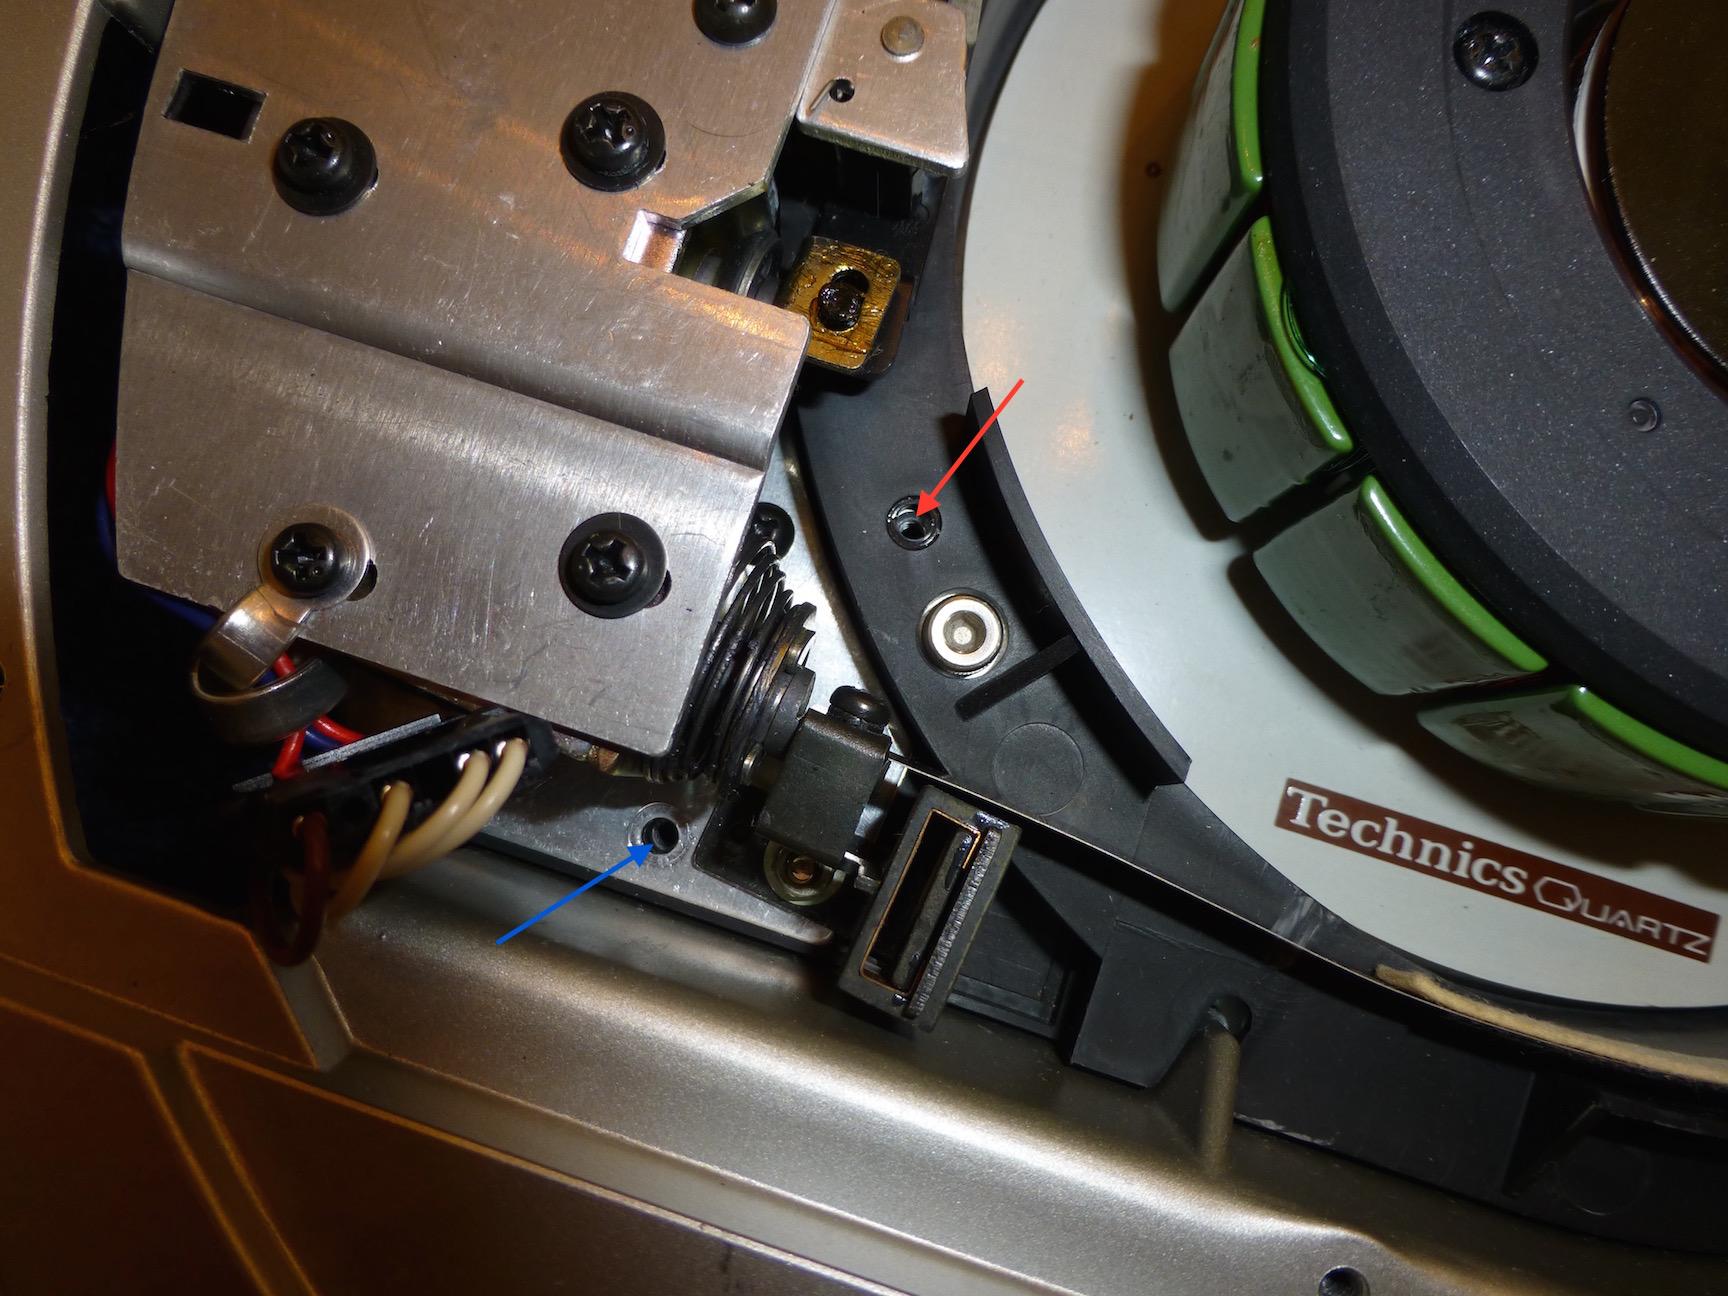 The Incredible Technics SP-10 MK3 Thread-p1010535-jpg